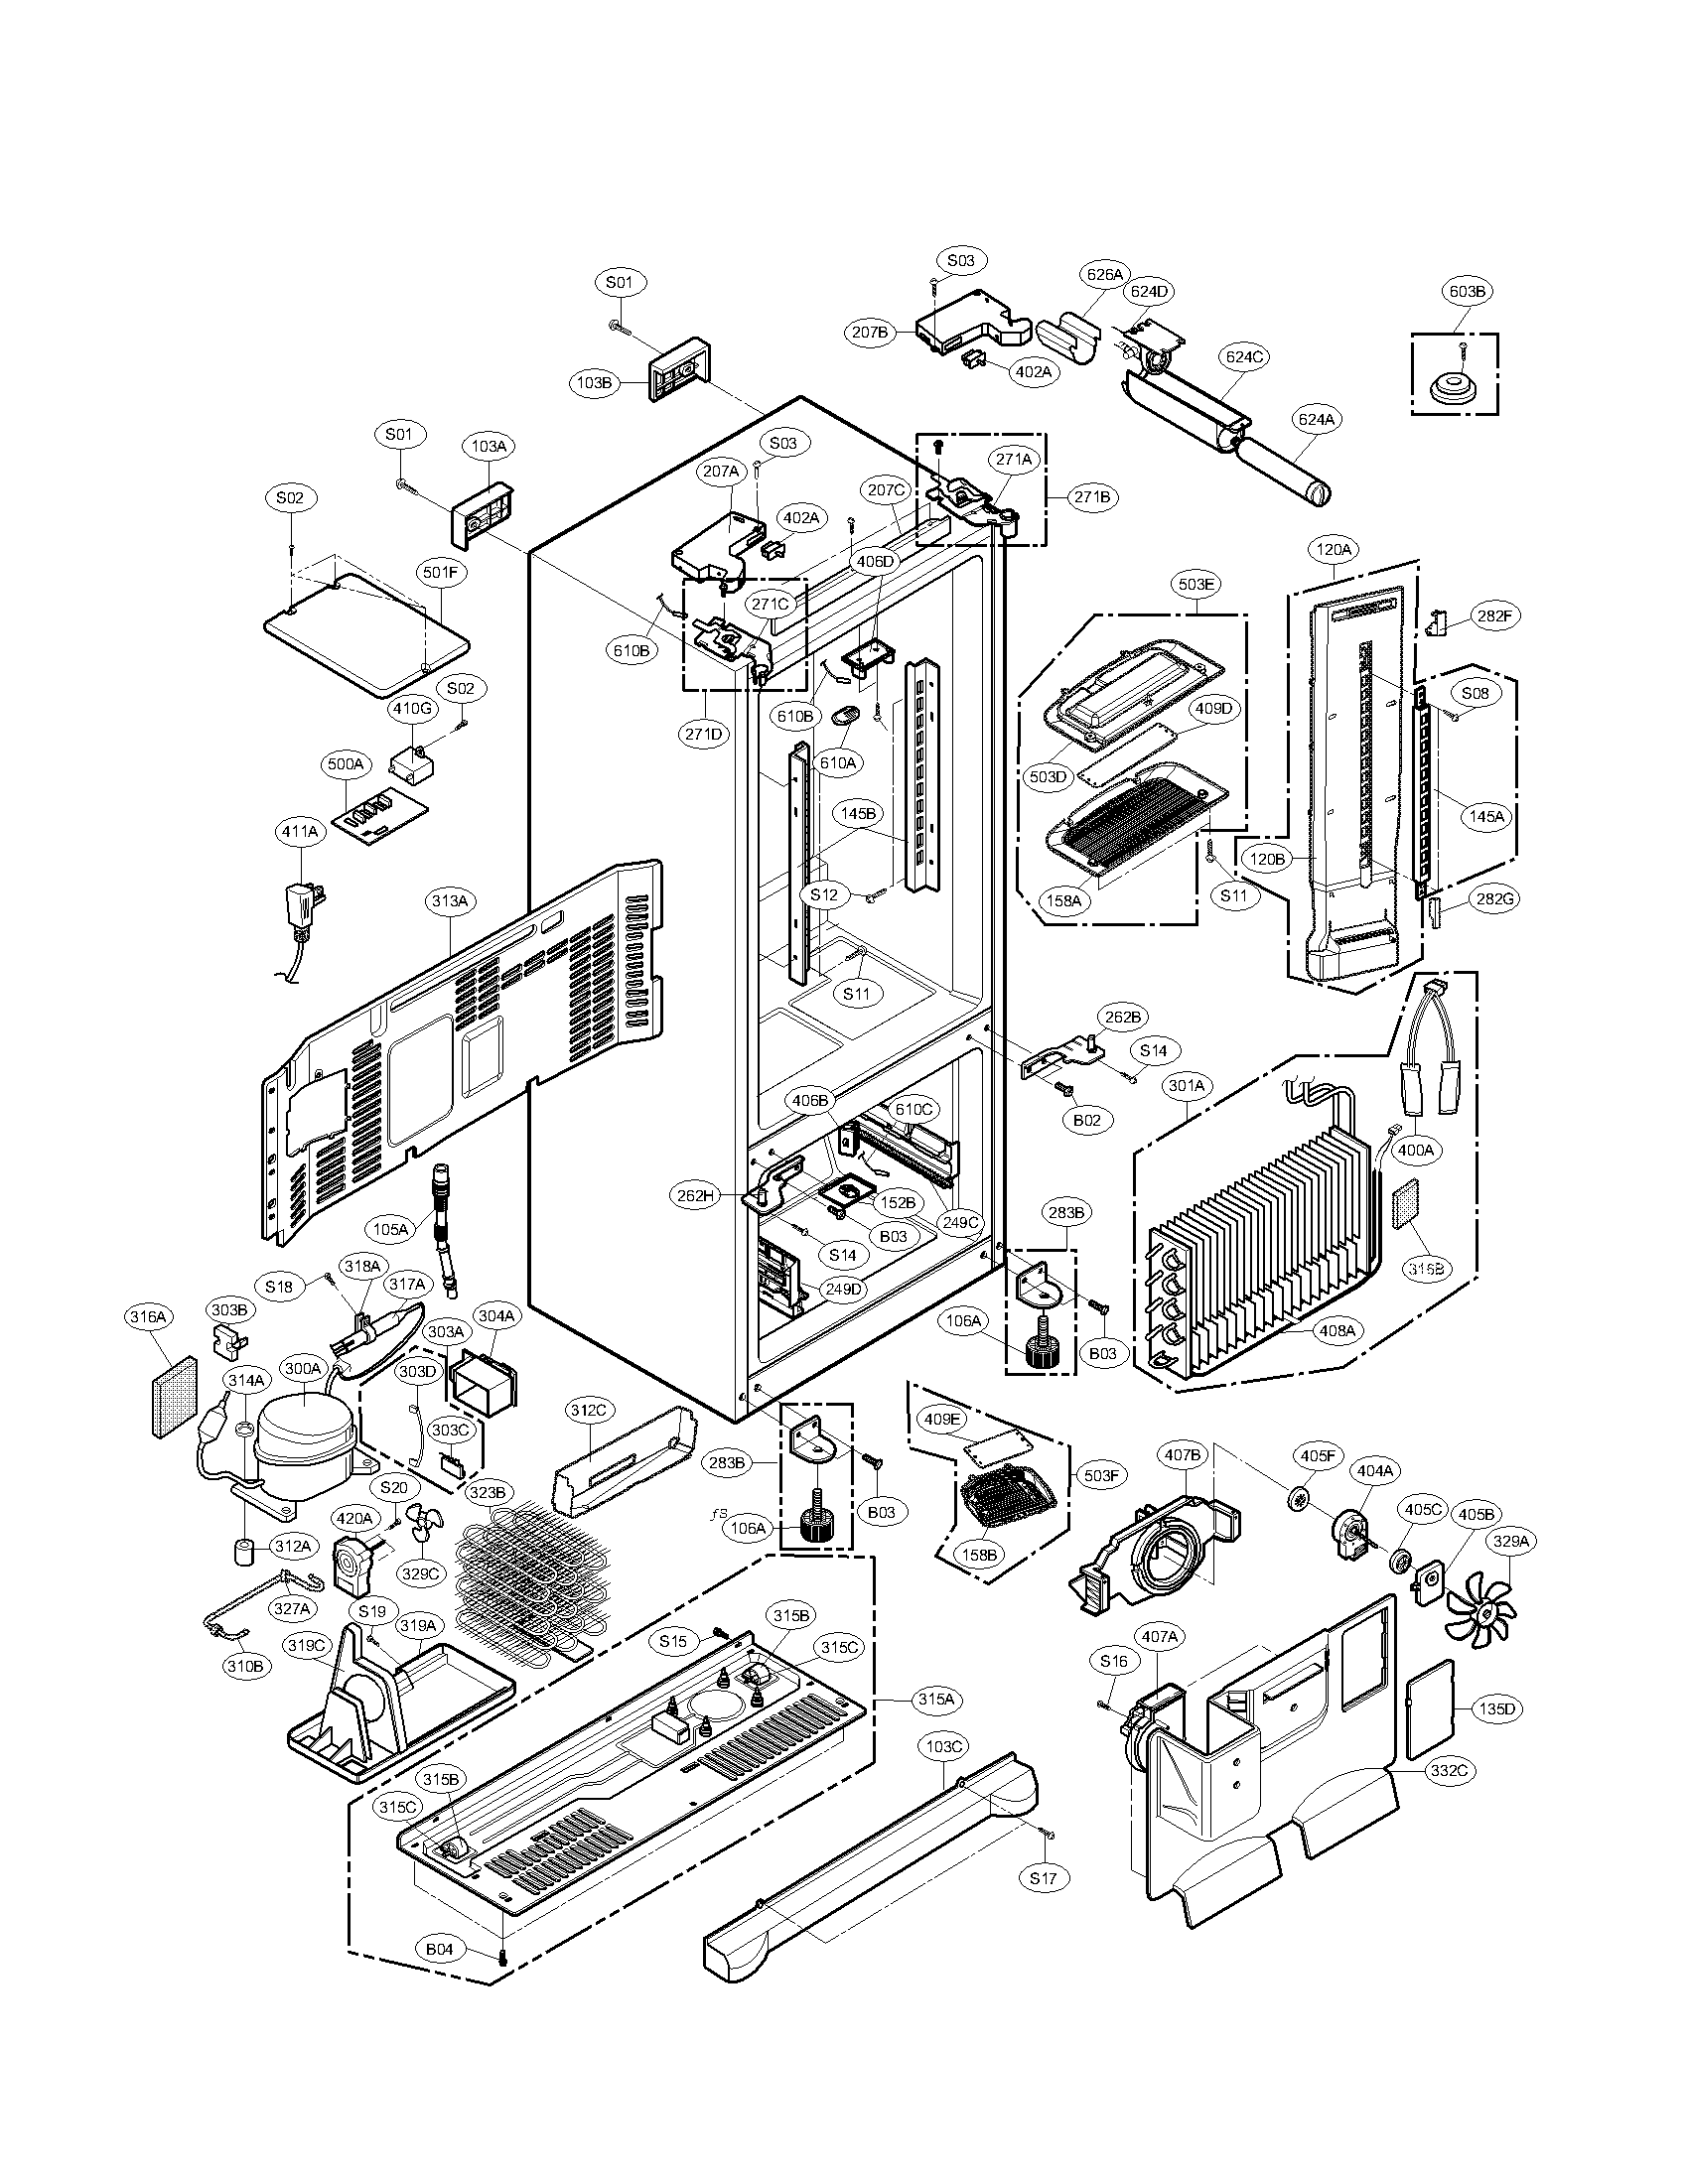 refrigerator frigidaire dishwasher kenmore elite floor plans appliances diagram model  [ 1700 x 2200 Pixel ]